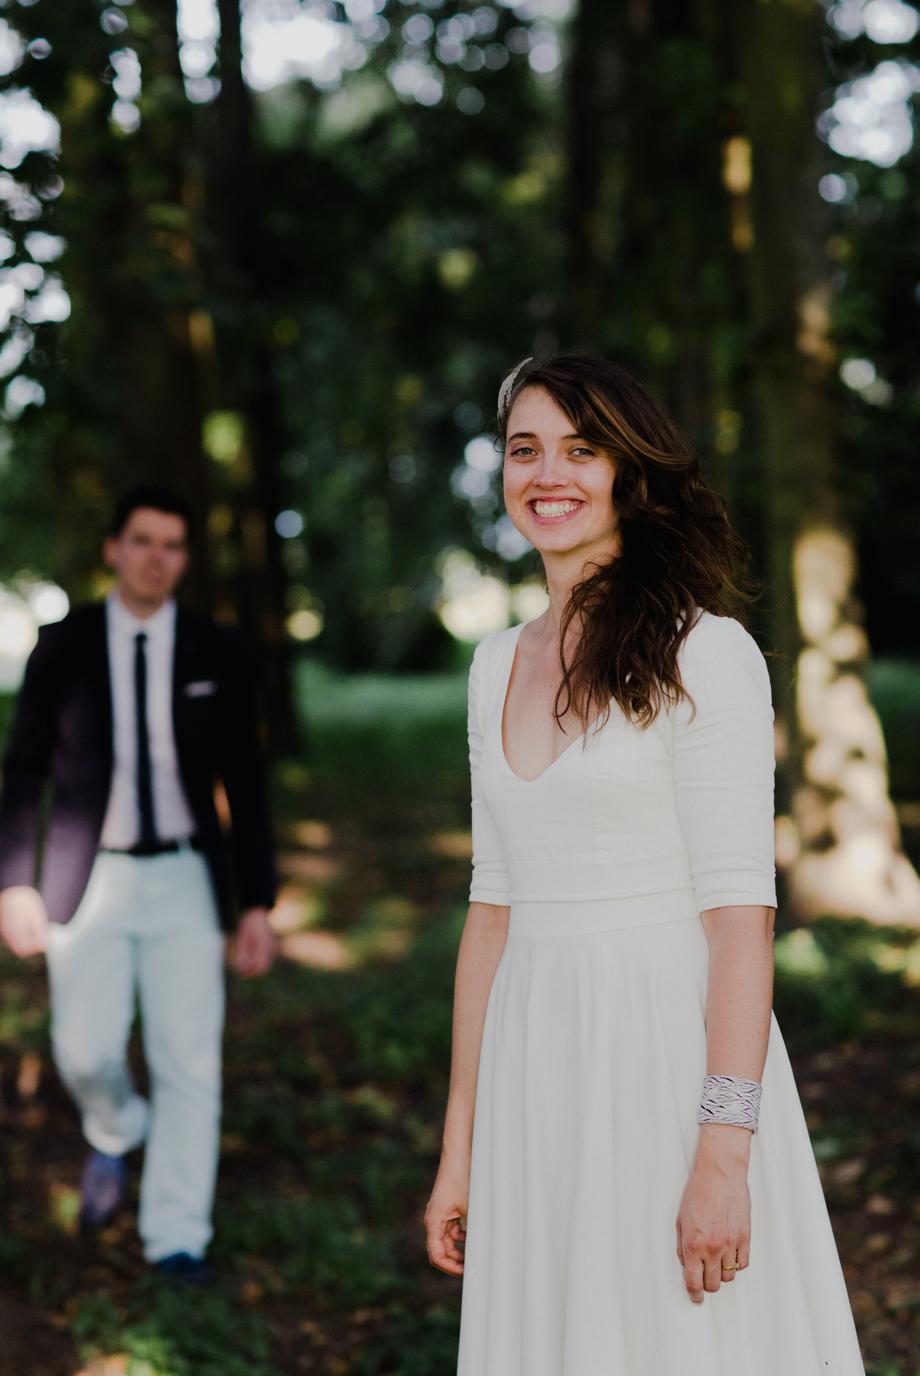 photographe reportage mariage champetre provence drome documentaire destination wedding photographer france-41